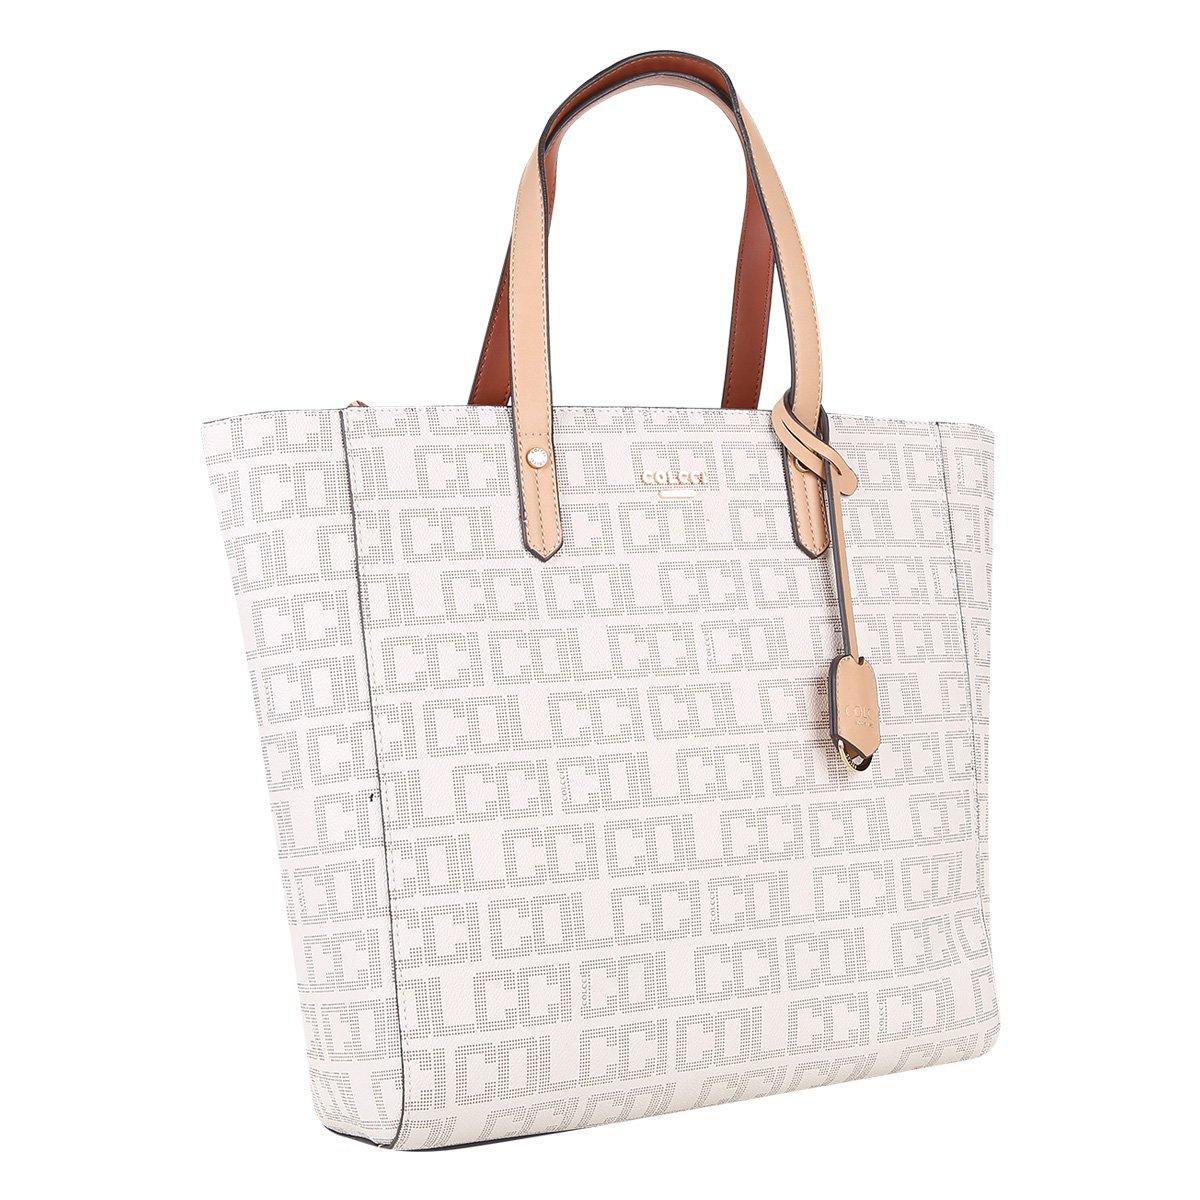 ff9e624a9c Bolsa Colcci Shopper Logomania Feminina - Compre Agora